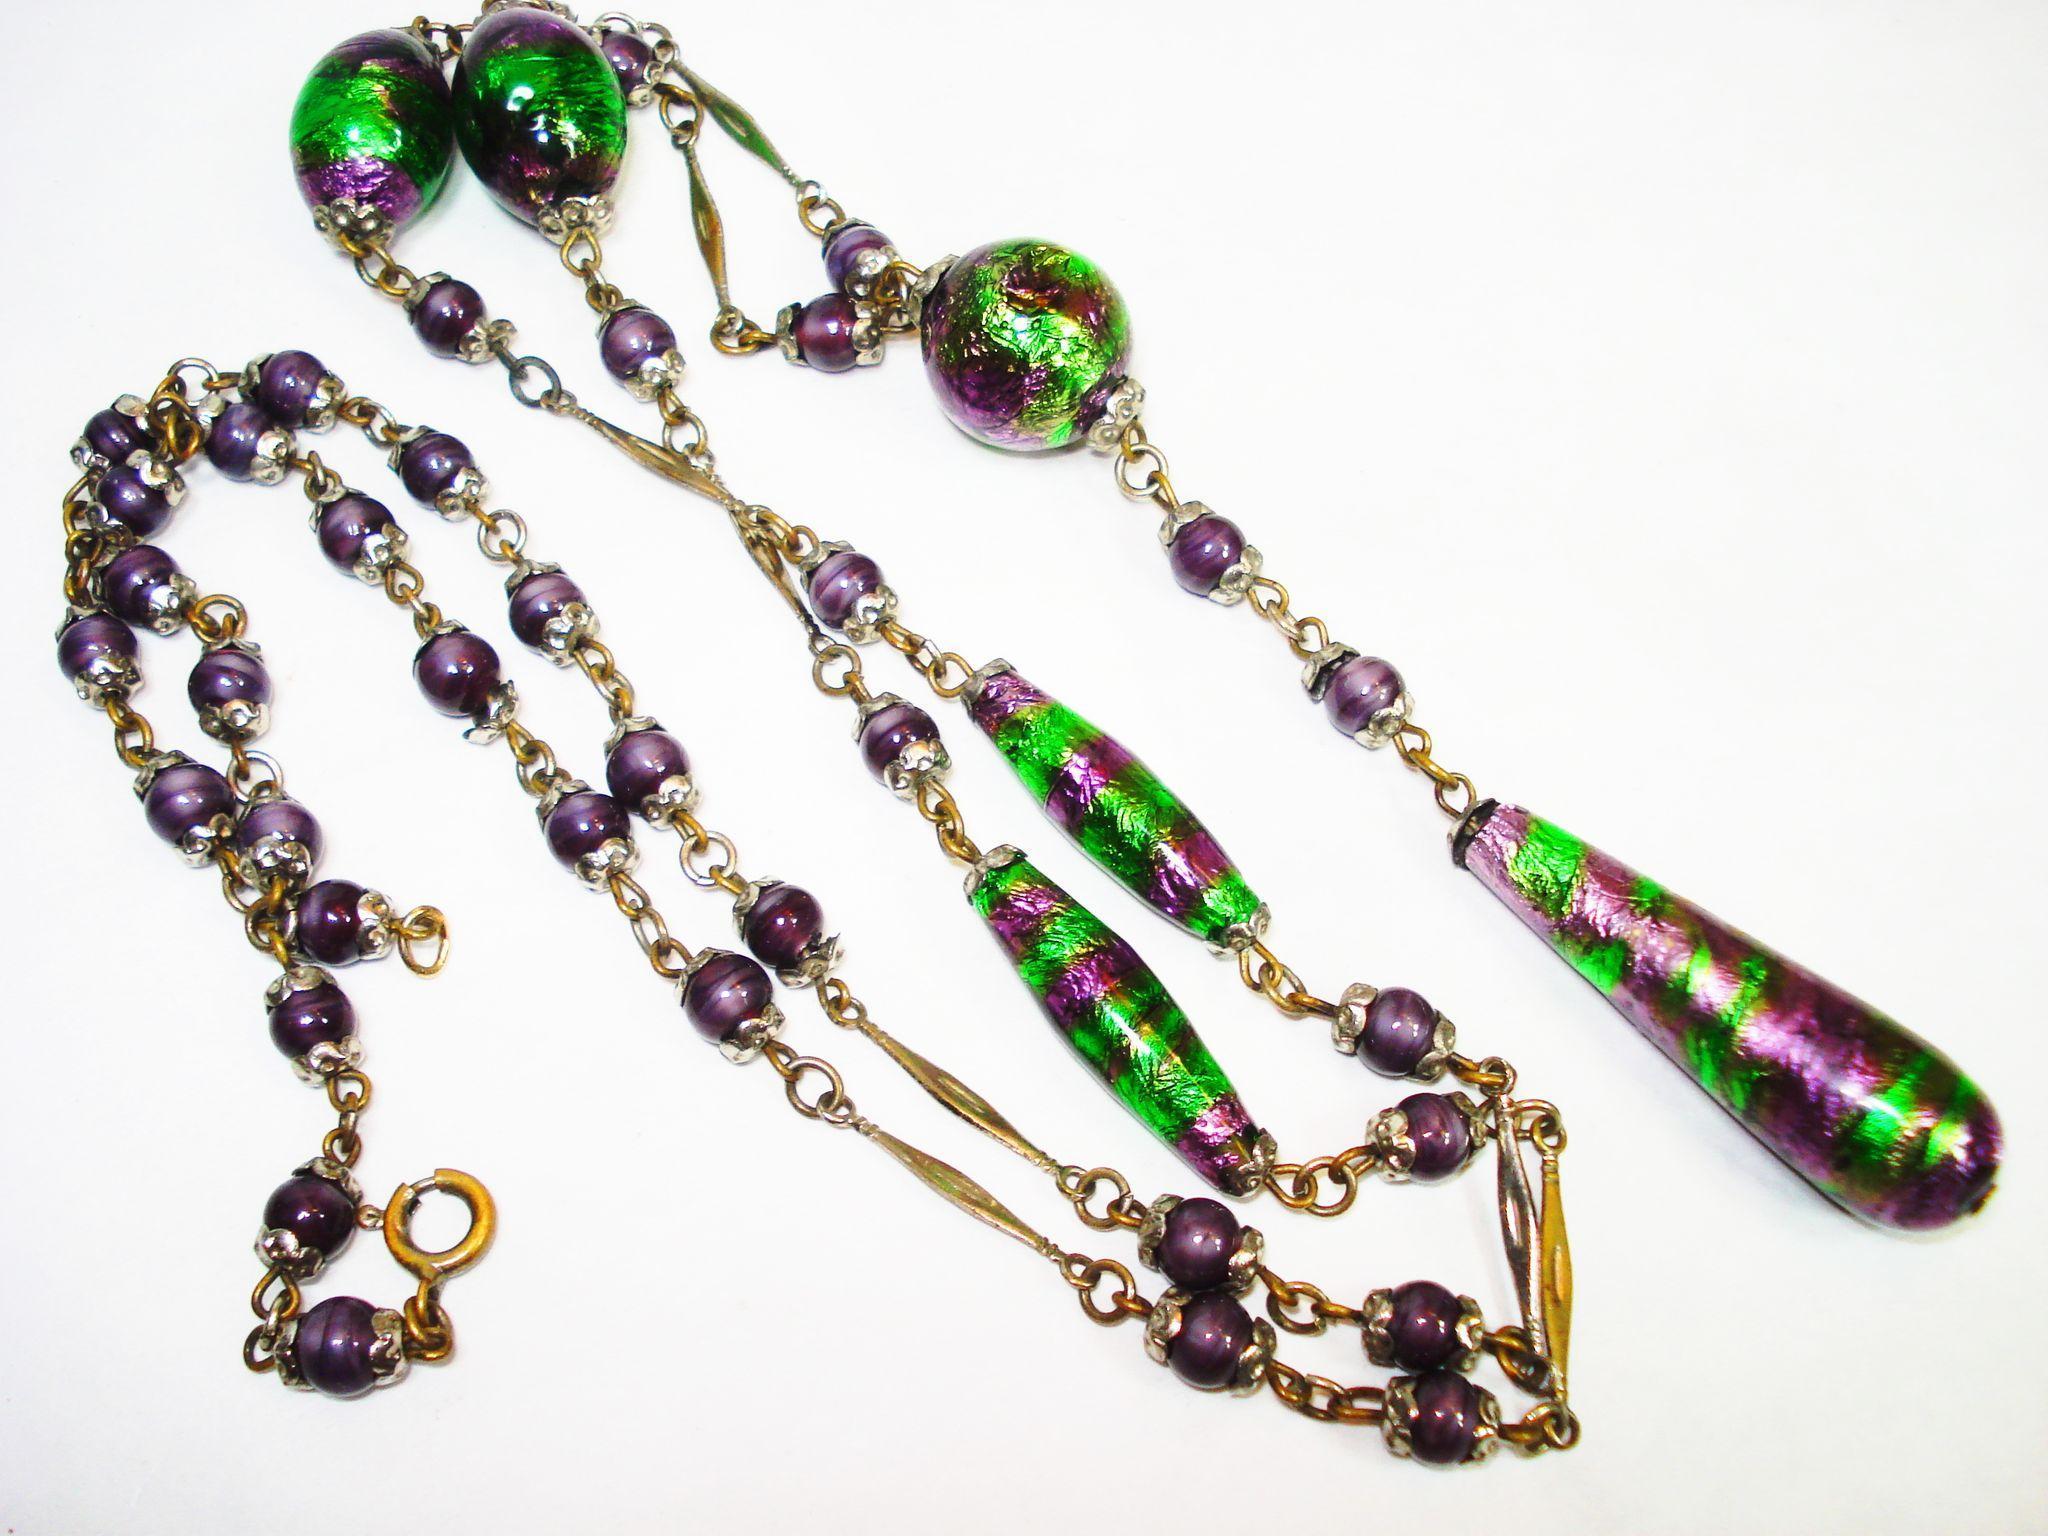 RARE Edwardian  Foiled Art Glass Czech Sautoir Necklace